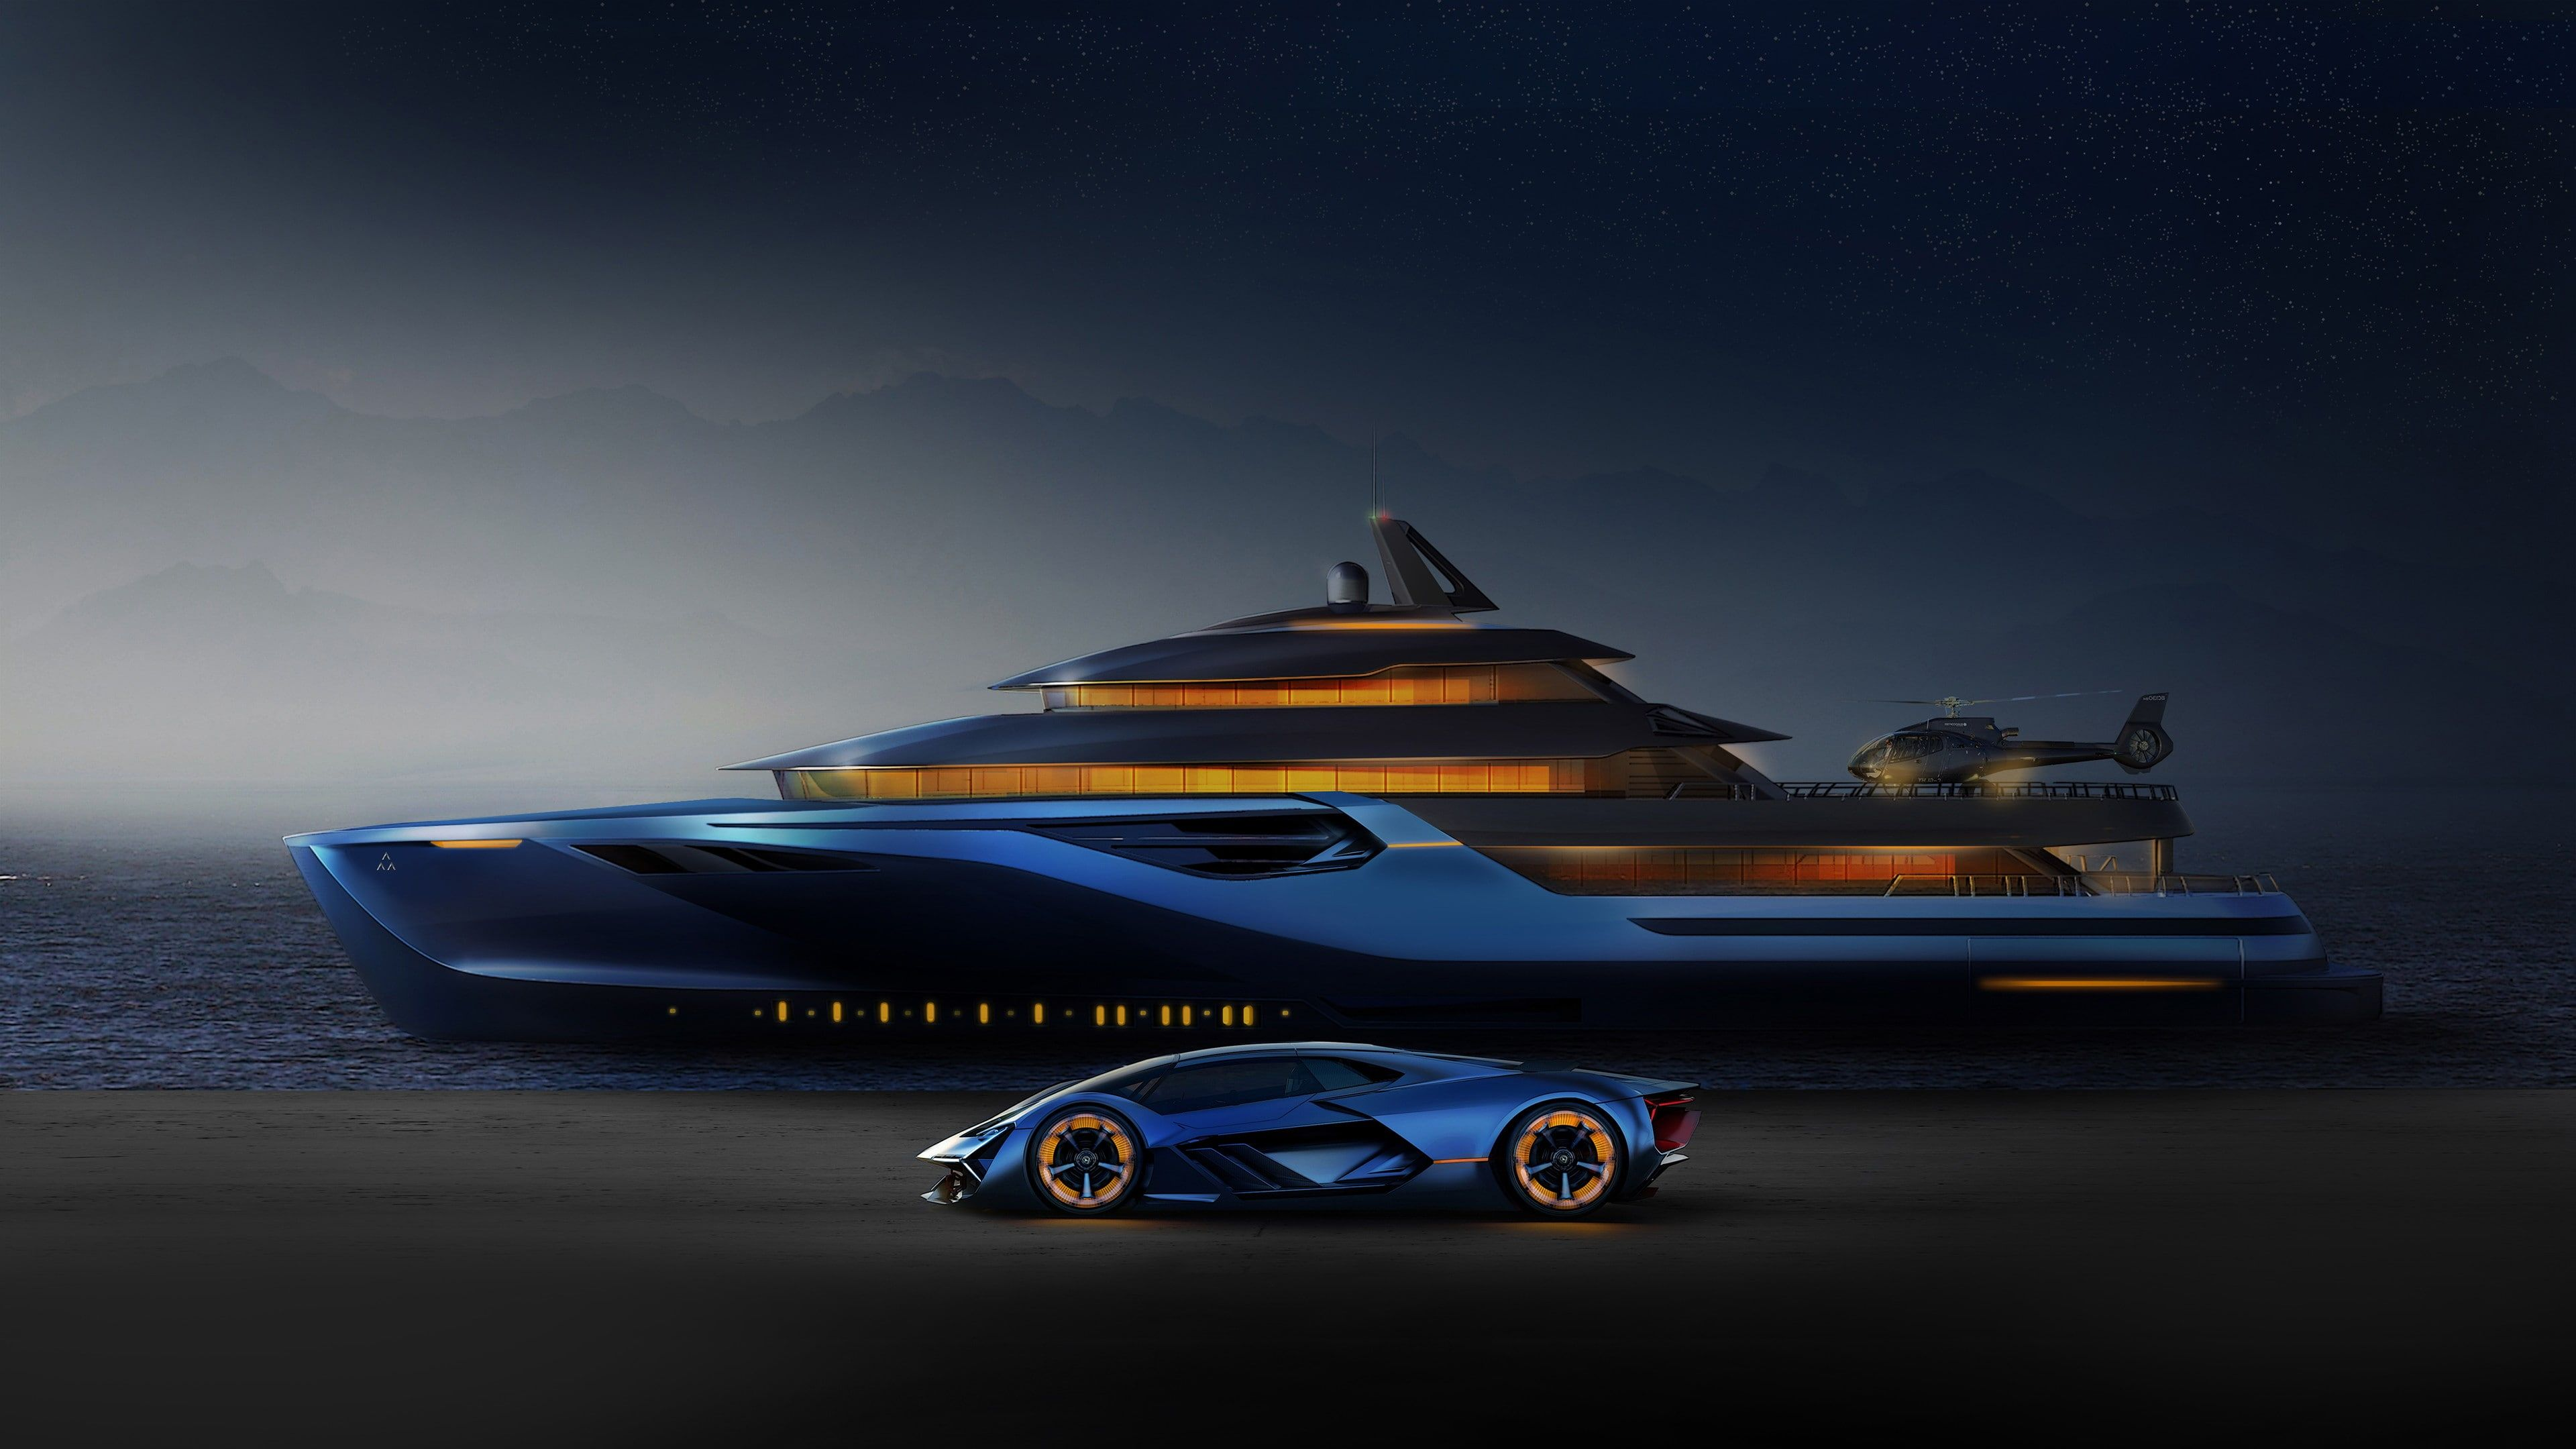 Yacht Vehicle Lamborghini Terzo Millennio Luxury Yacht Concept Car Lamborghini Luxury Car Ship Luxury 4k Wal Super Cars Concept Cars Lamborghini Concept